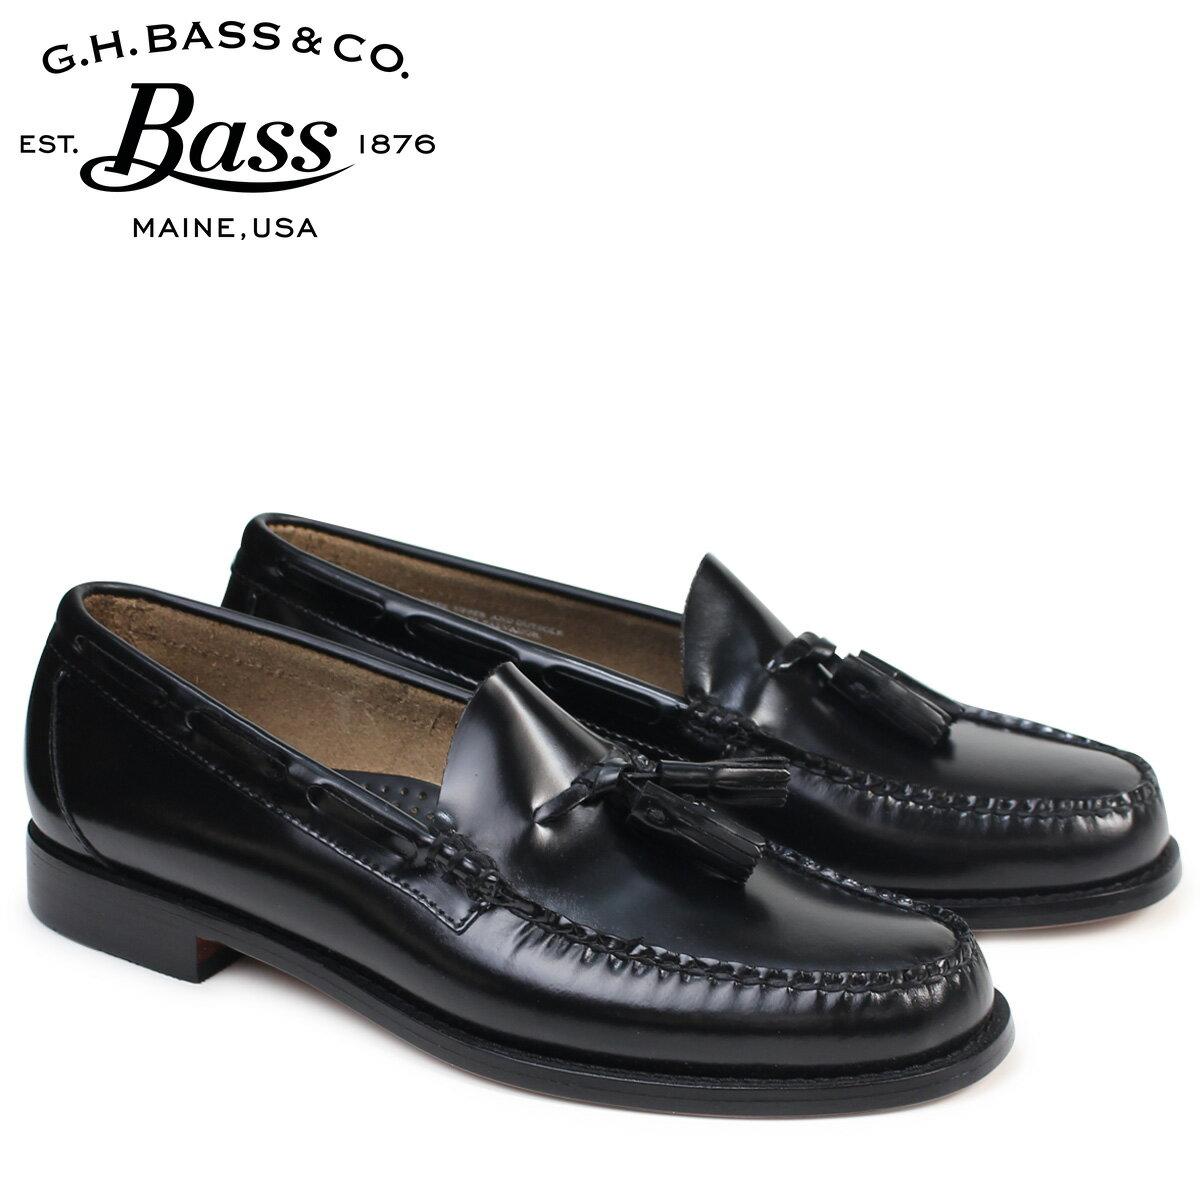 G.H. BASS ローファー ジーエイチバス メンズ ペニー タッセル LEXINGTON TASSEL WEEJUNS 70-10904 靴 ブラック [2/1 追加入荷]